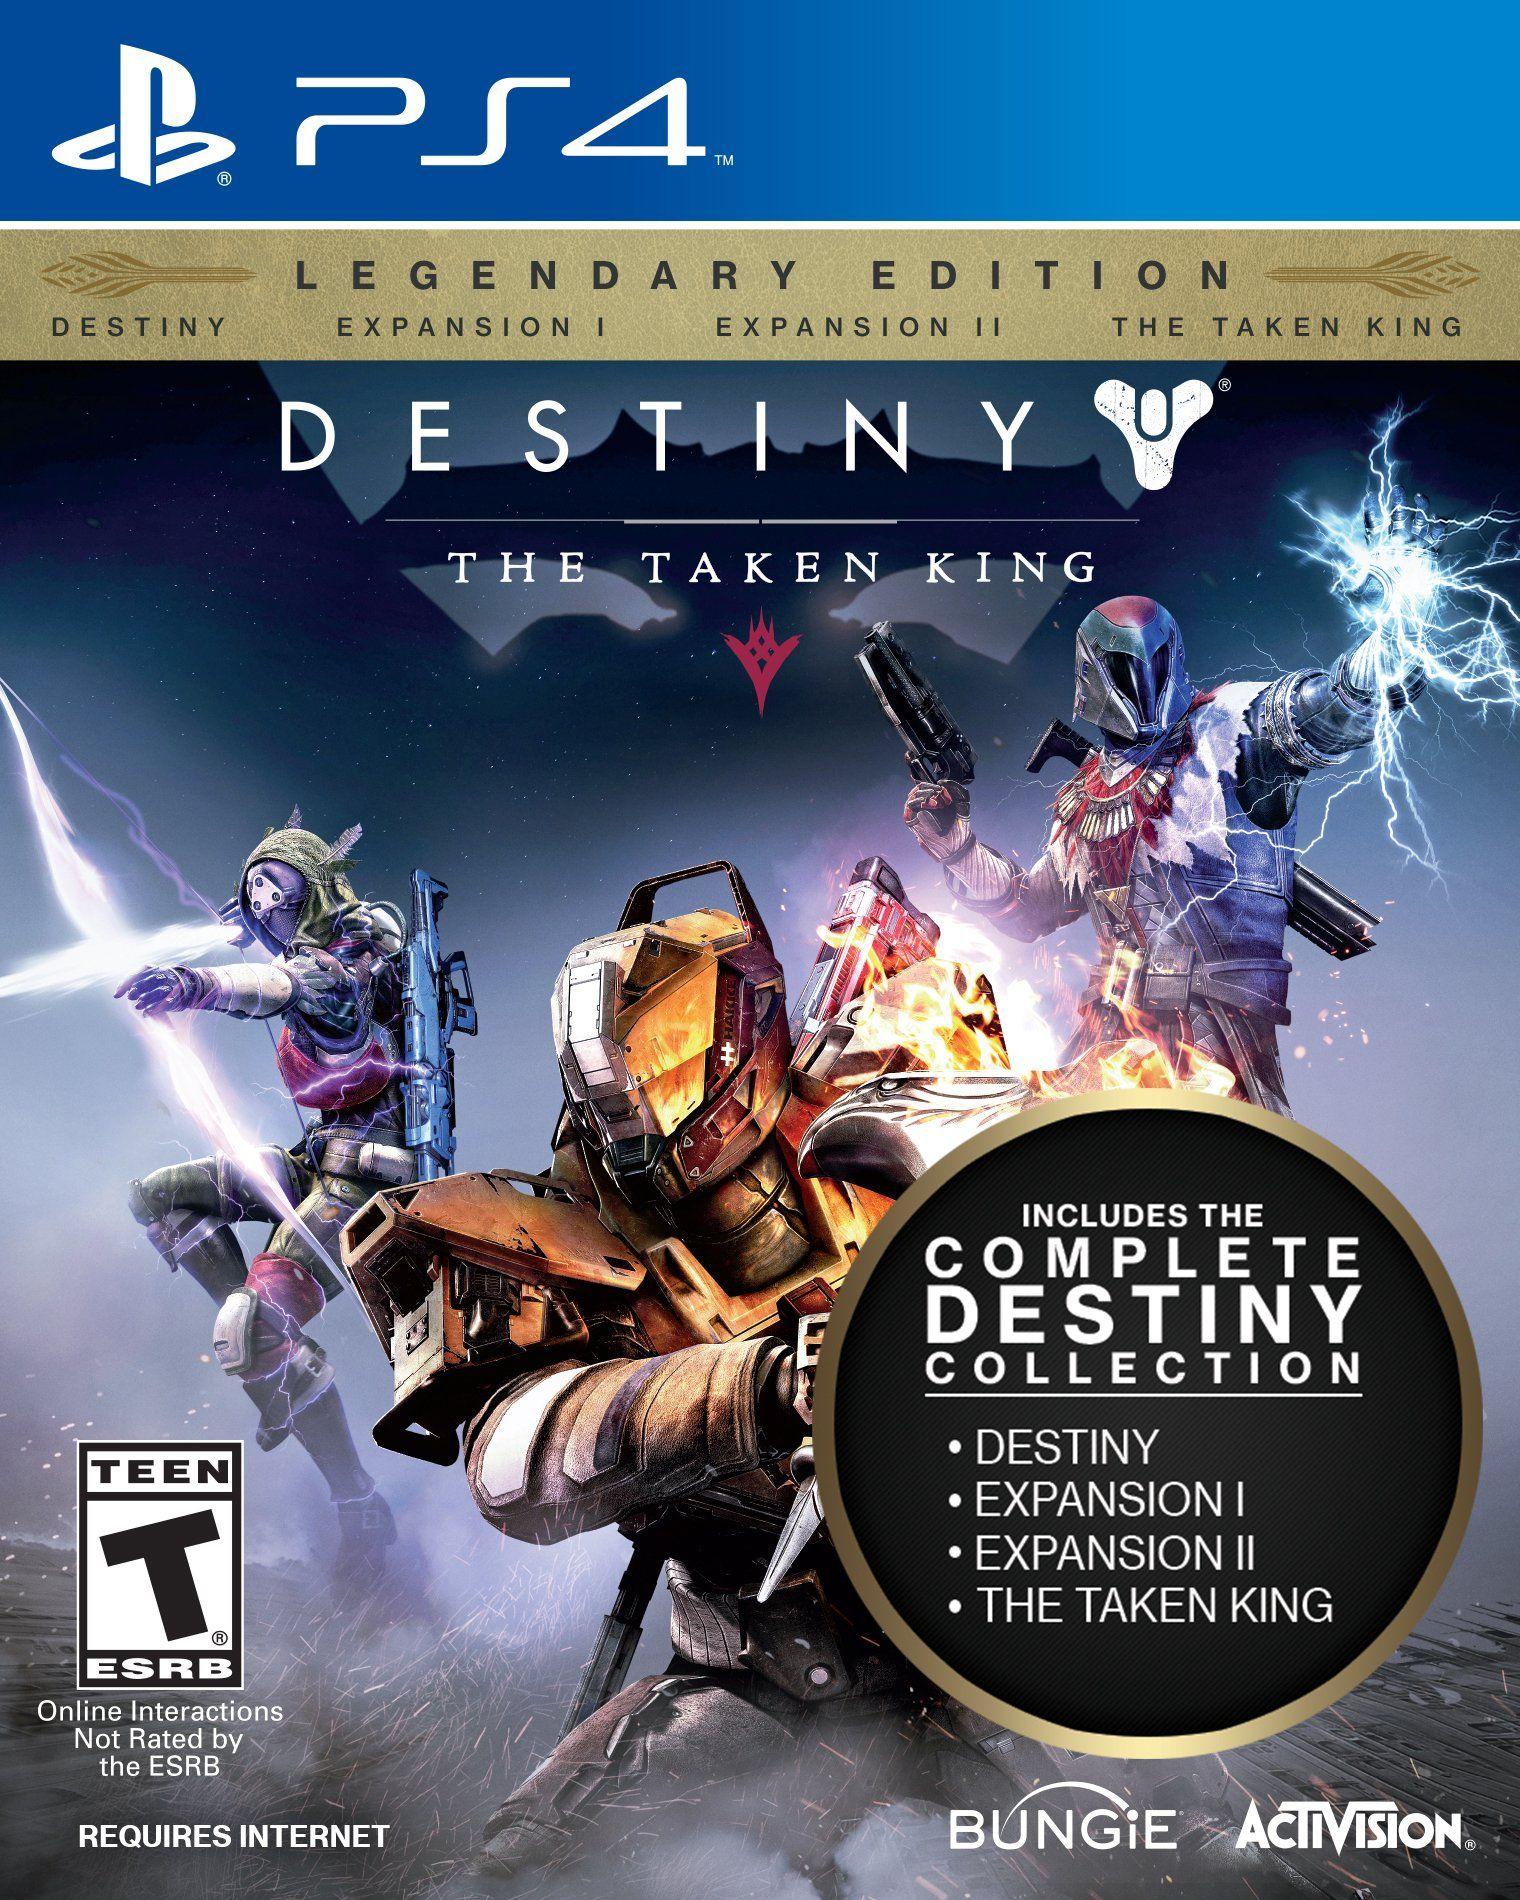 Amazon Com Destiny The Taken King Legendary Edition Playstation 4 Video Games Brett Request Destiny The Taken King The Taken Xbox One